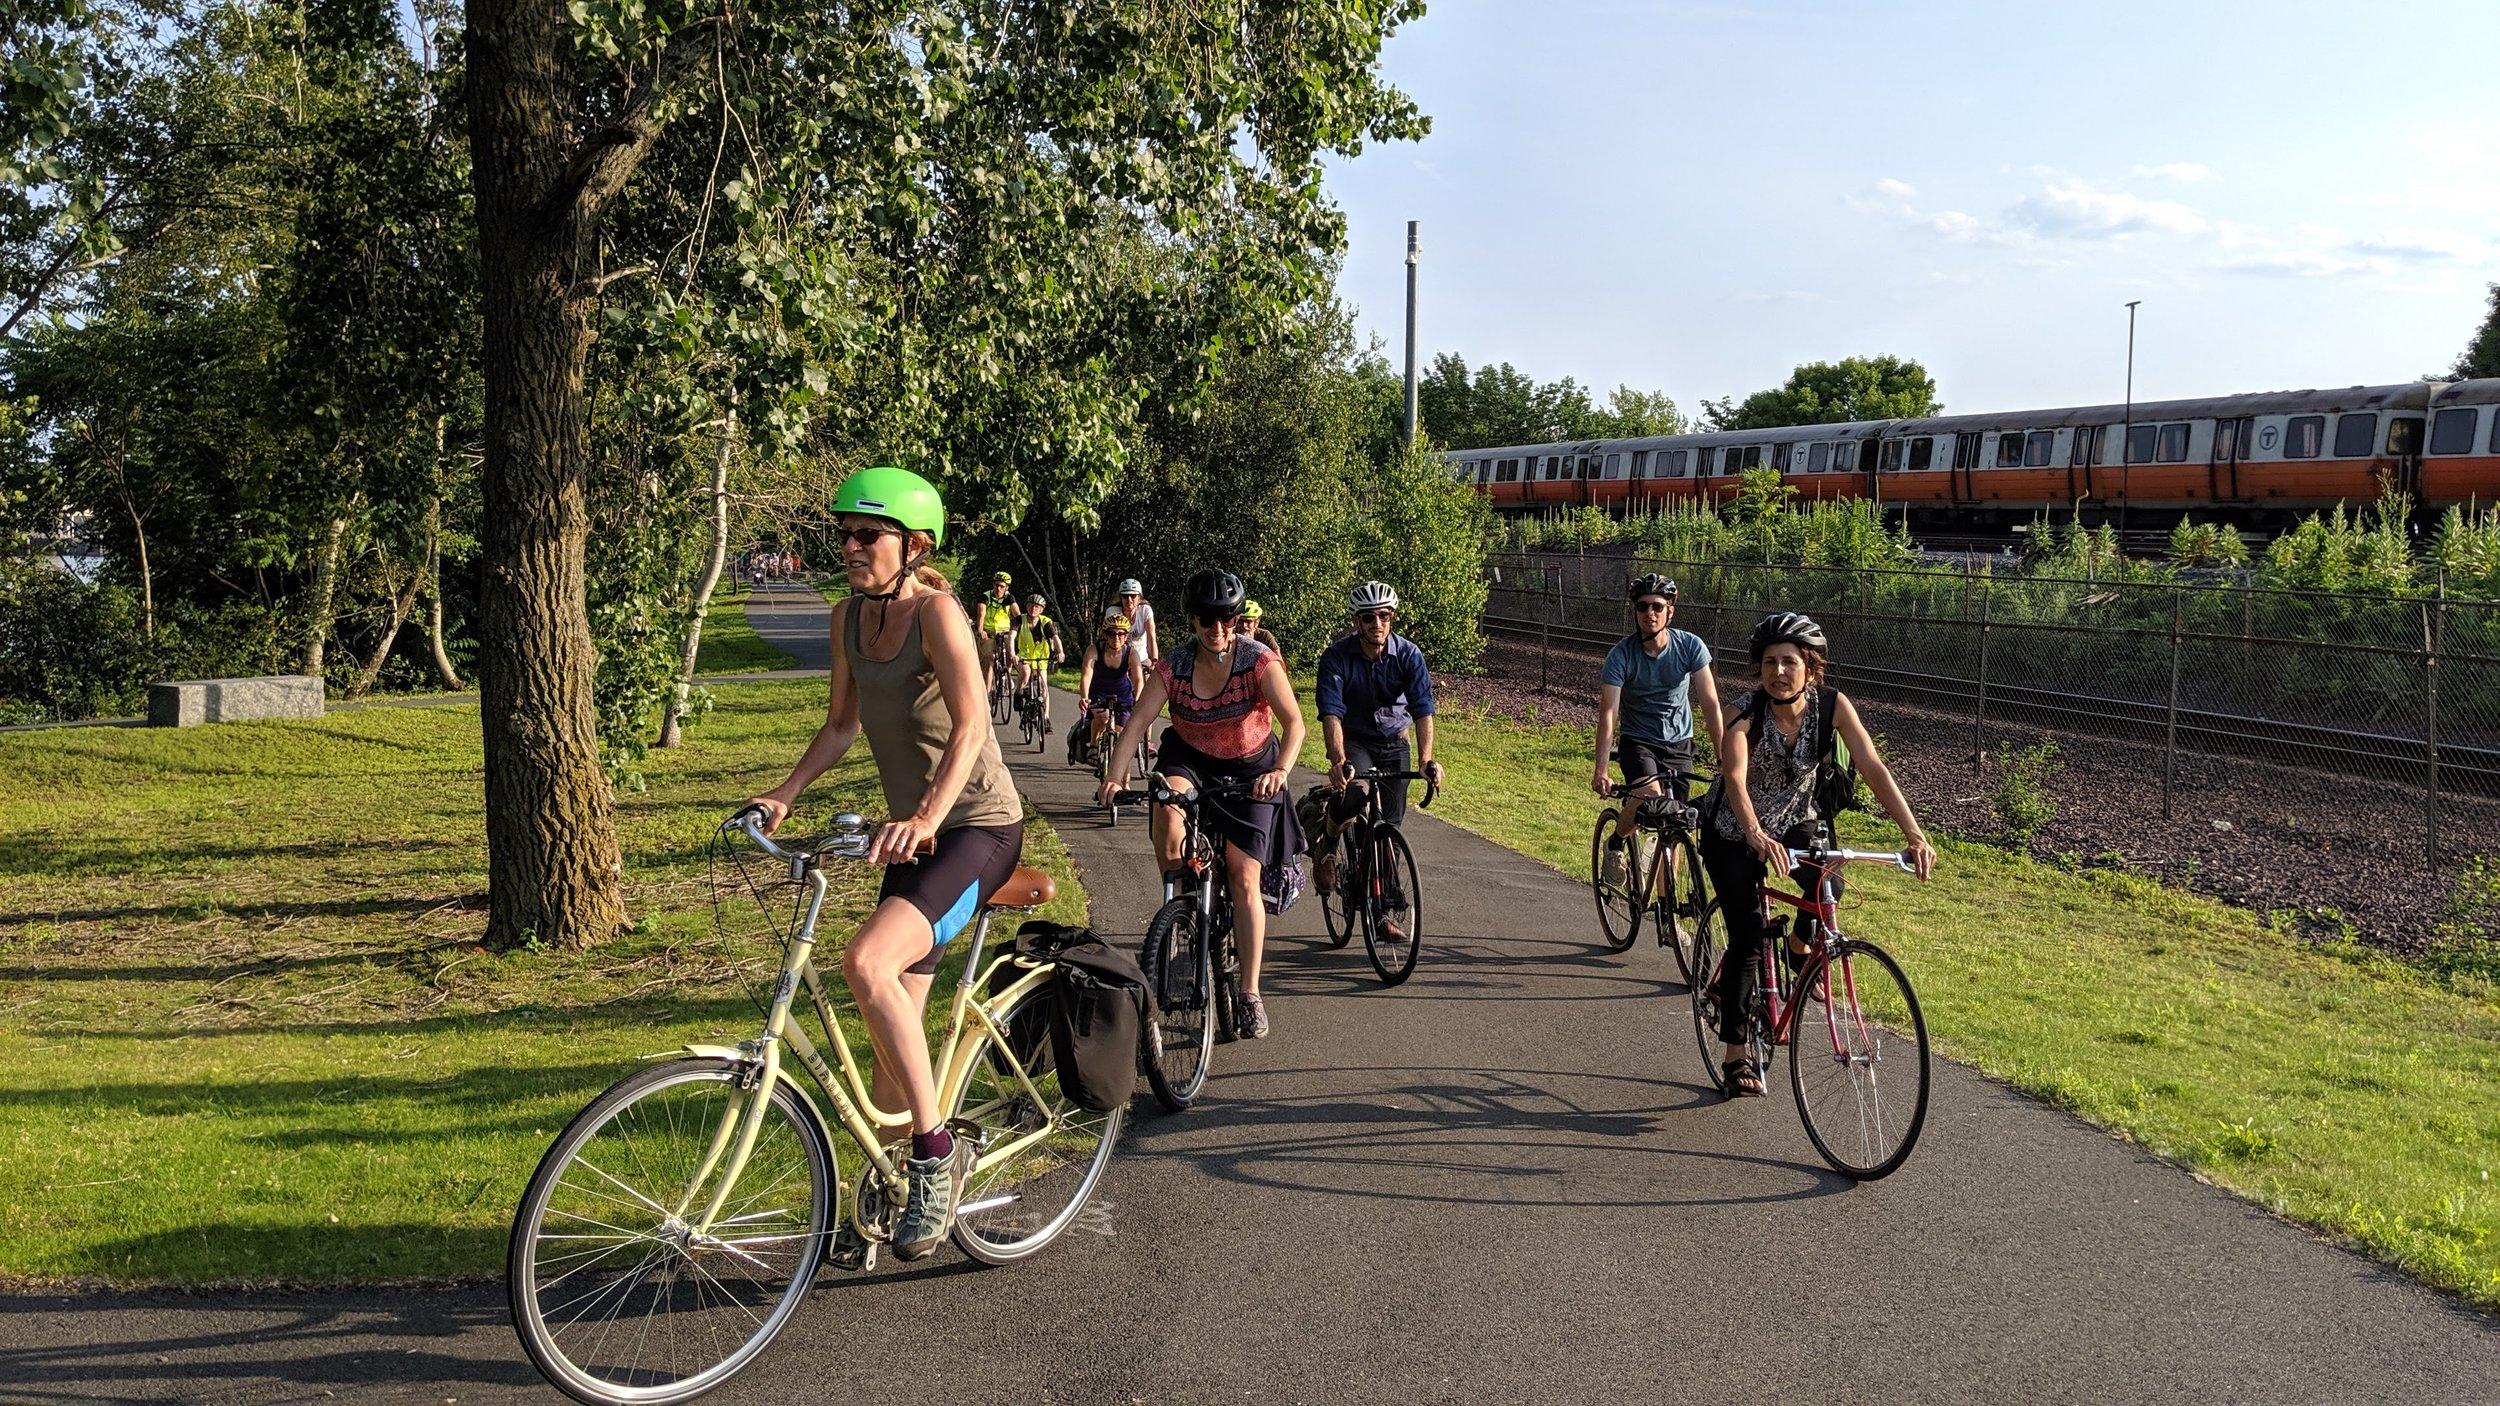 Wellington Greenway ride. - Medford